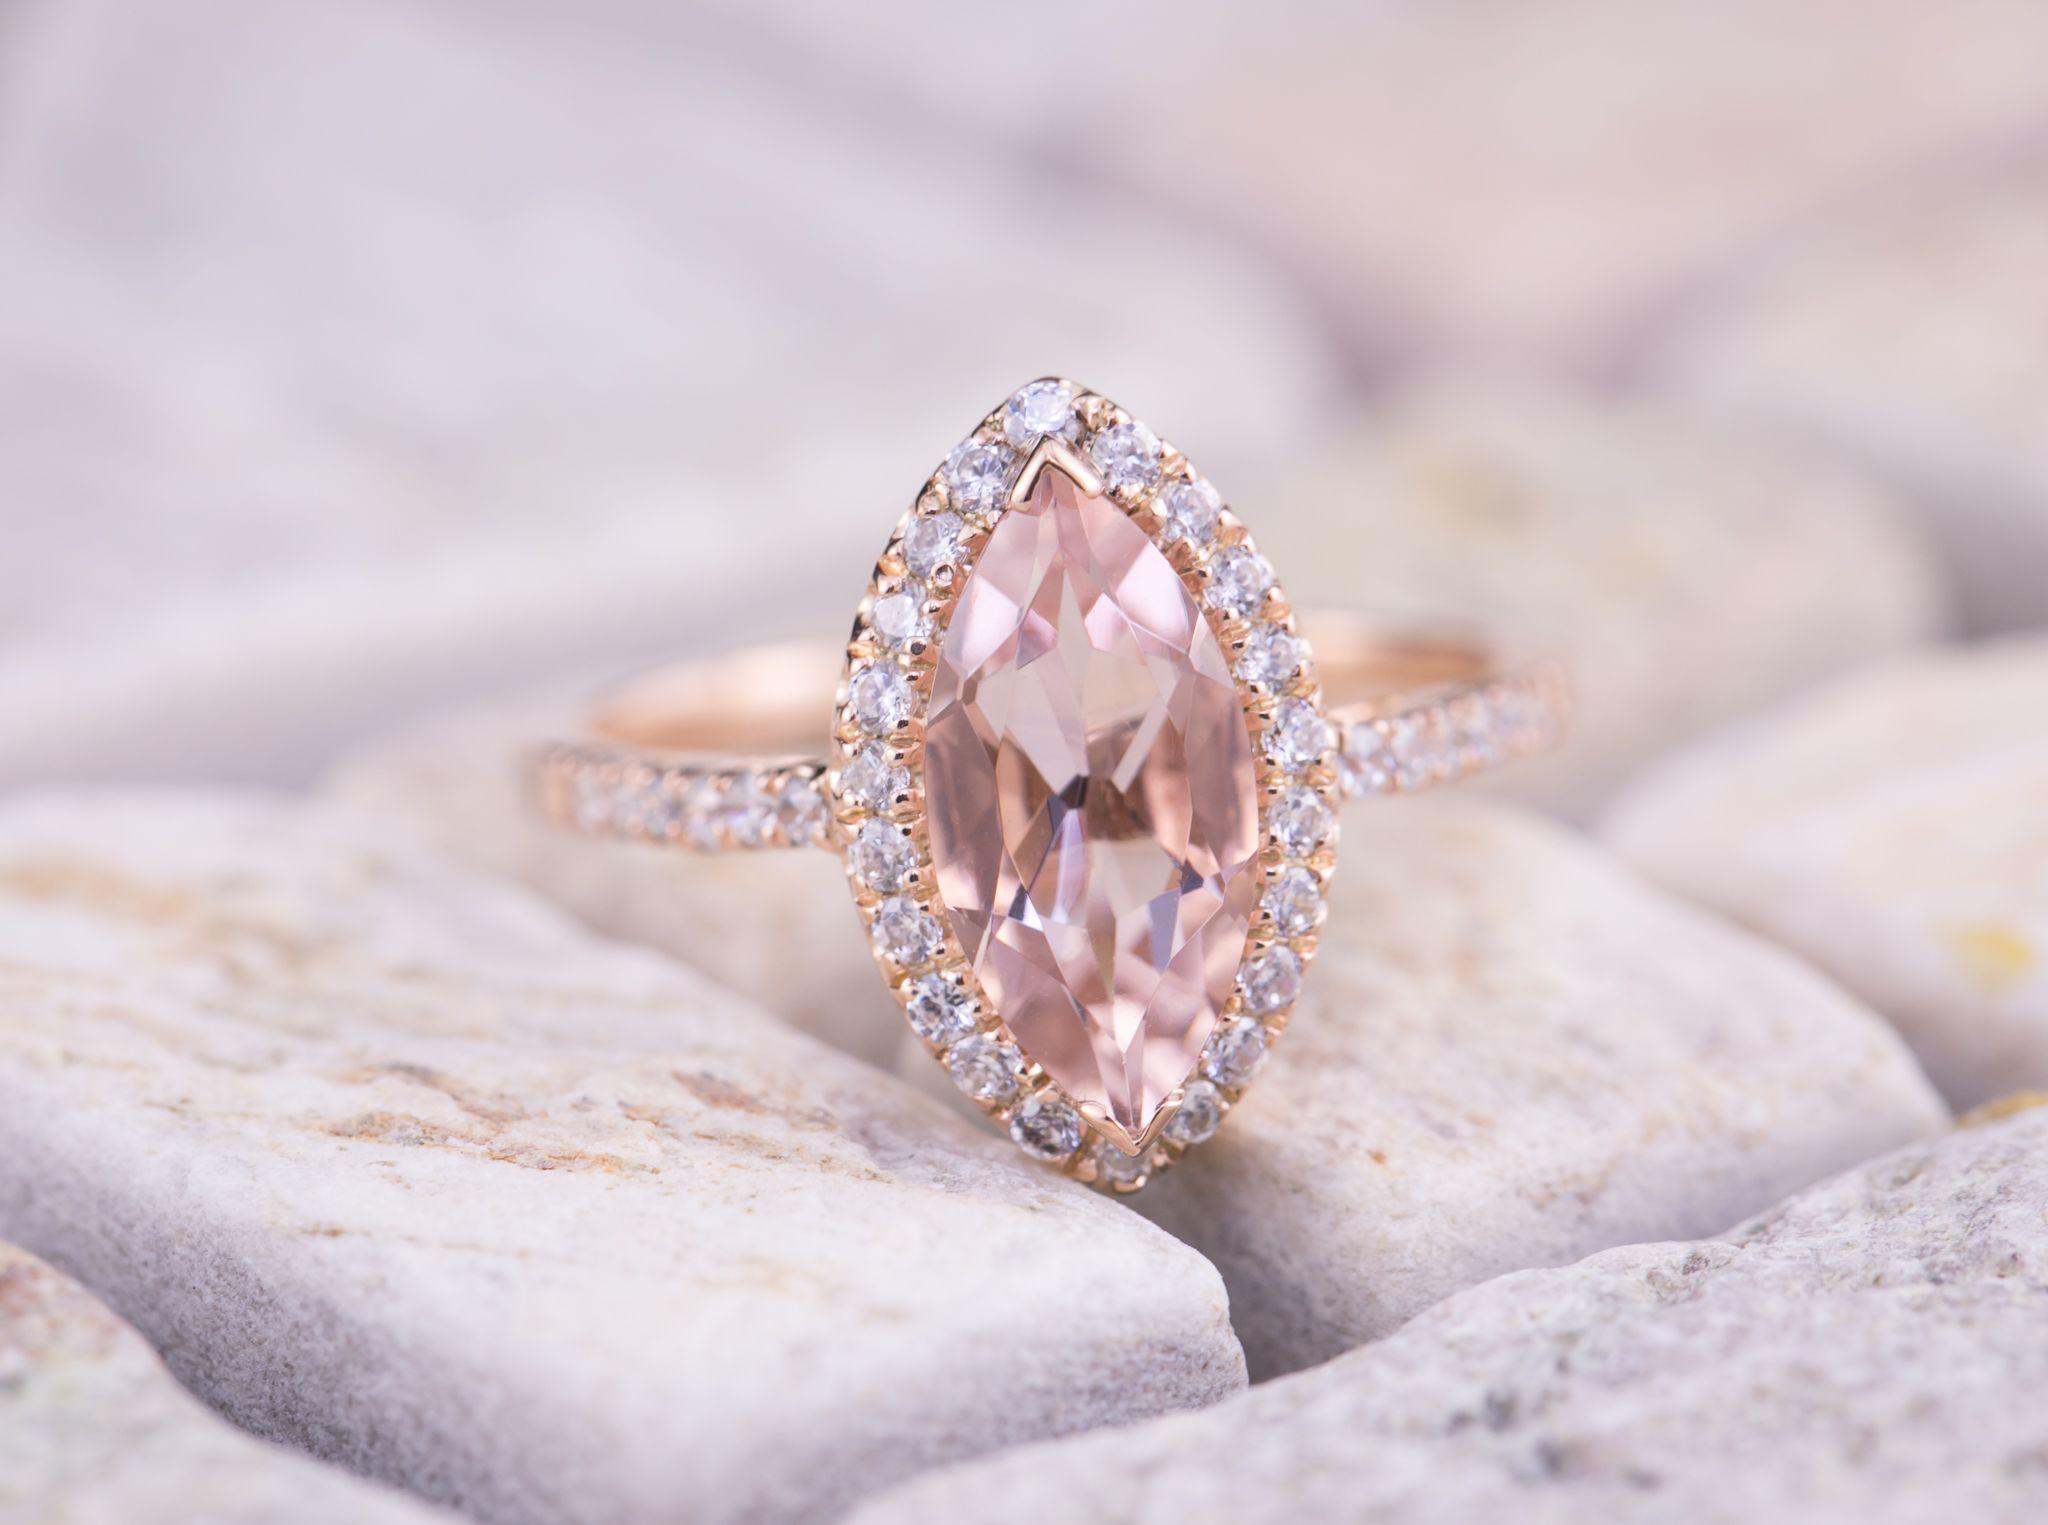 Magnifique morganite rose 18K Gold Filled Wedding Bridal Ring Bijoux Sz6-10 nouveau